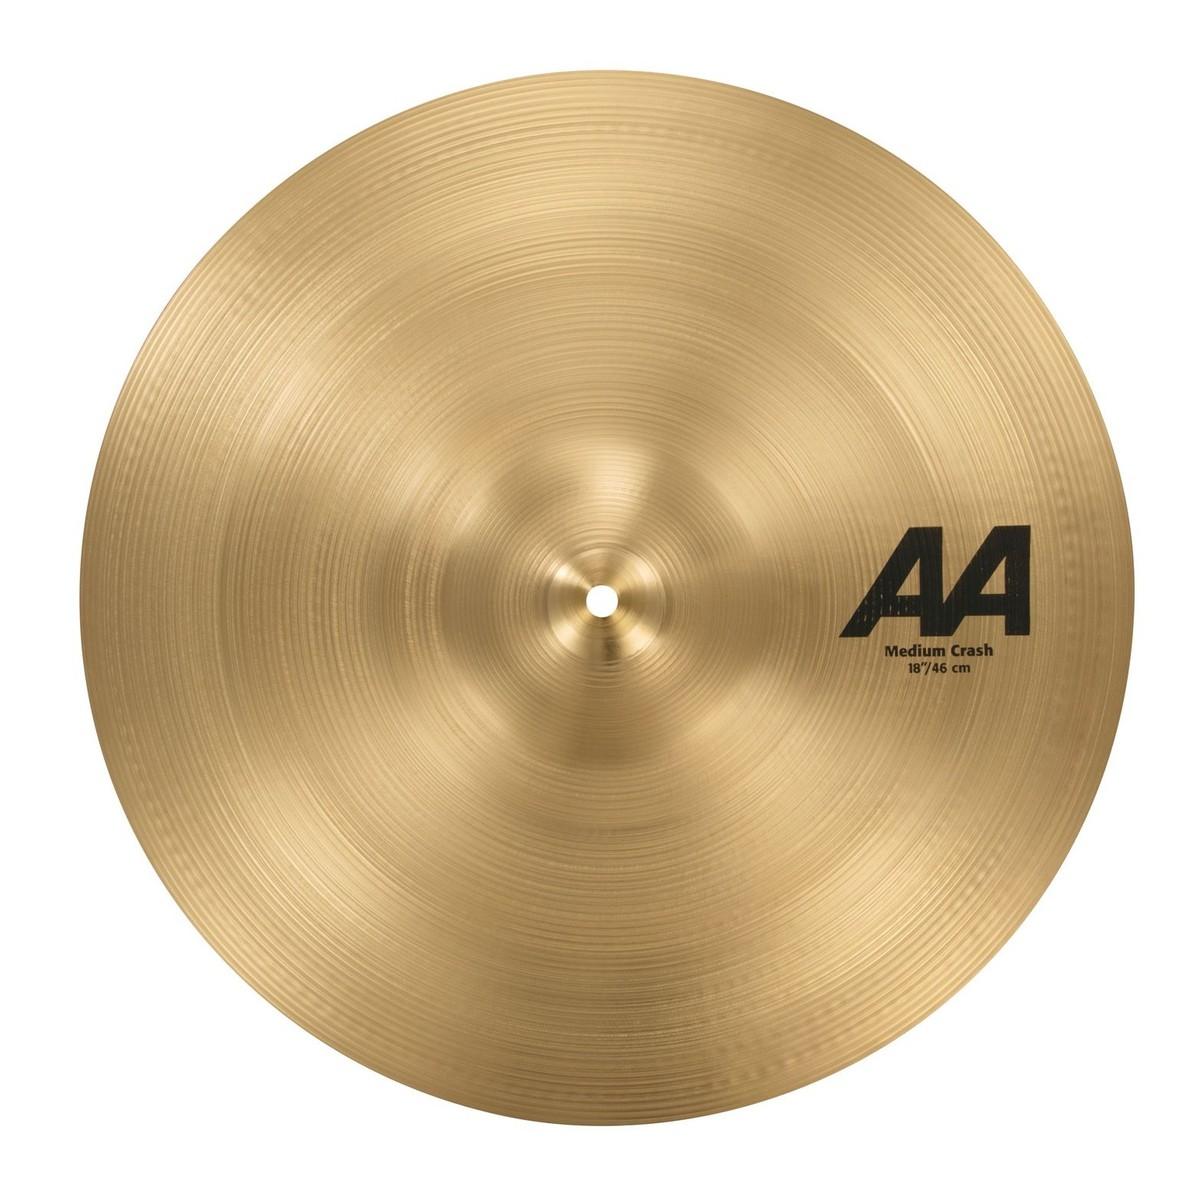 sabian aa 18 39 39 medium crash cymbal at gear4music. Black Bedroom Furniture Sets. Home Design Ideas